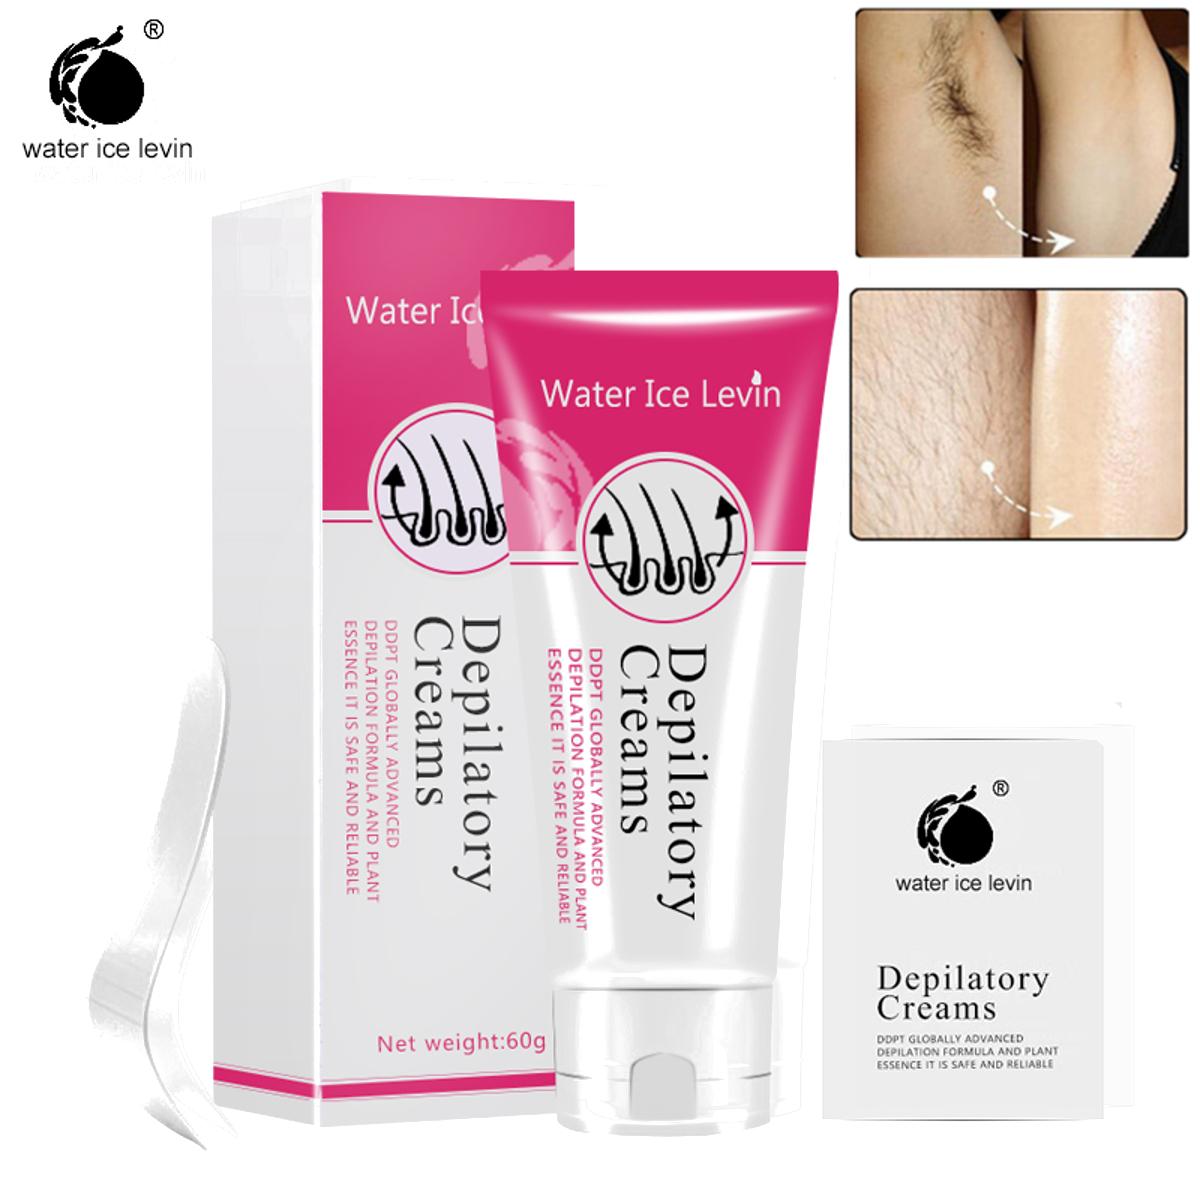 Water Ice Levin Painless Hair Removal Cream Legs Armpit Depilatory 60g SKU633192